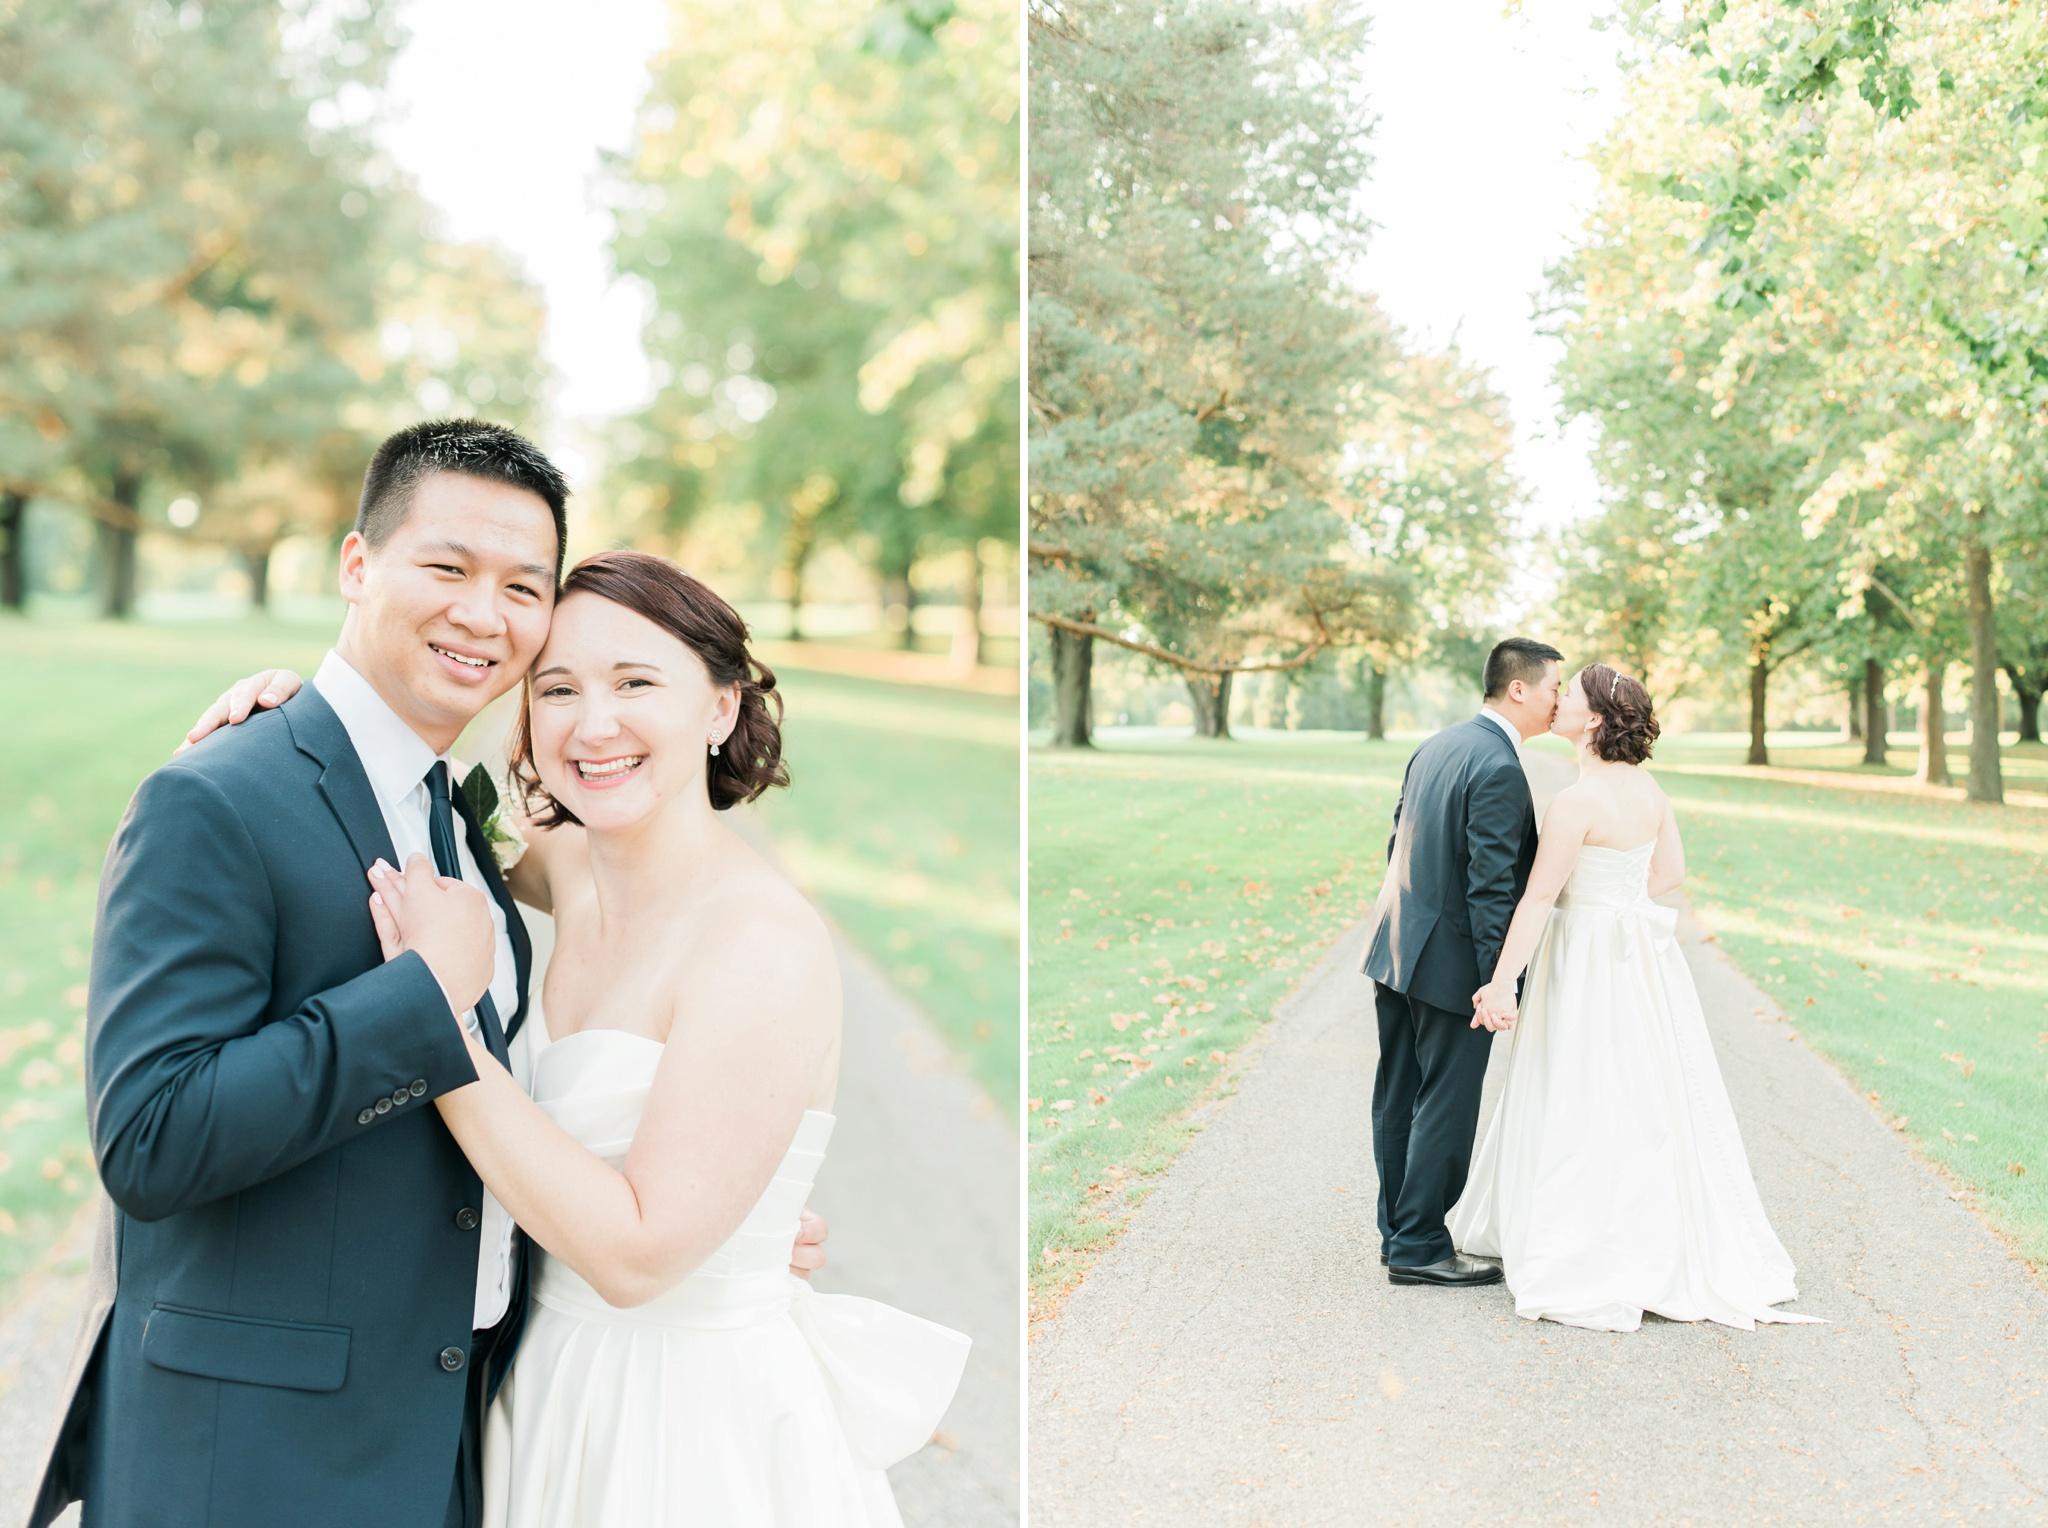 brookside-golf-country-club-wedding-columbus-ohio-118.jpg